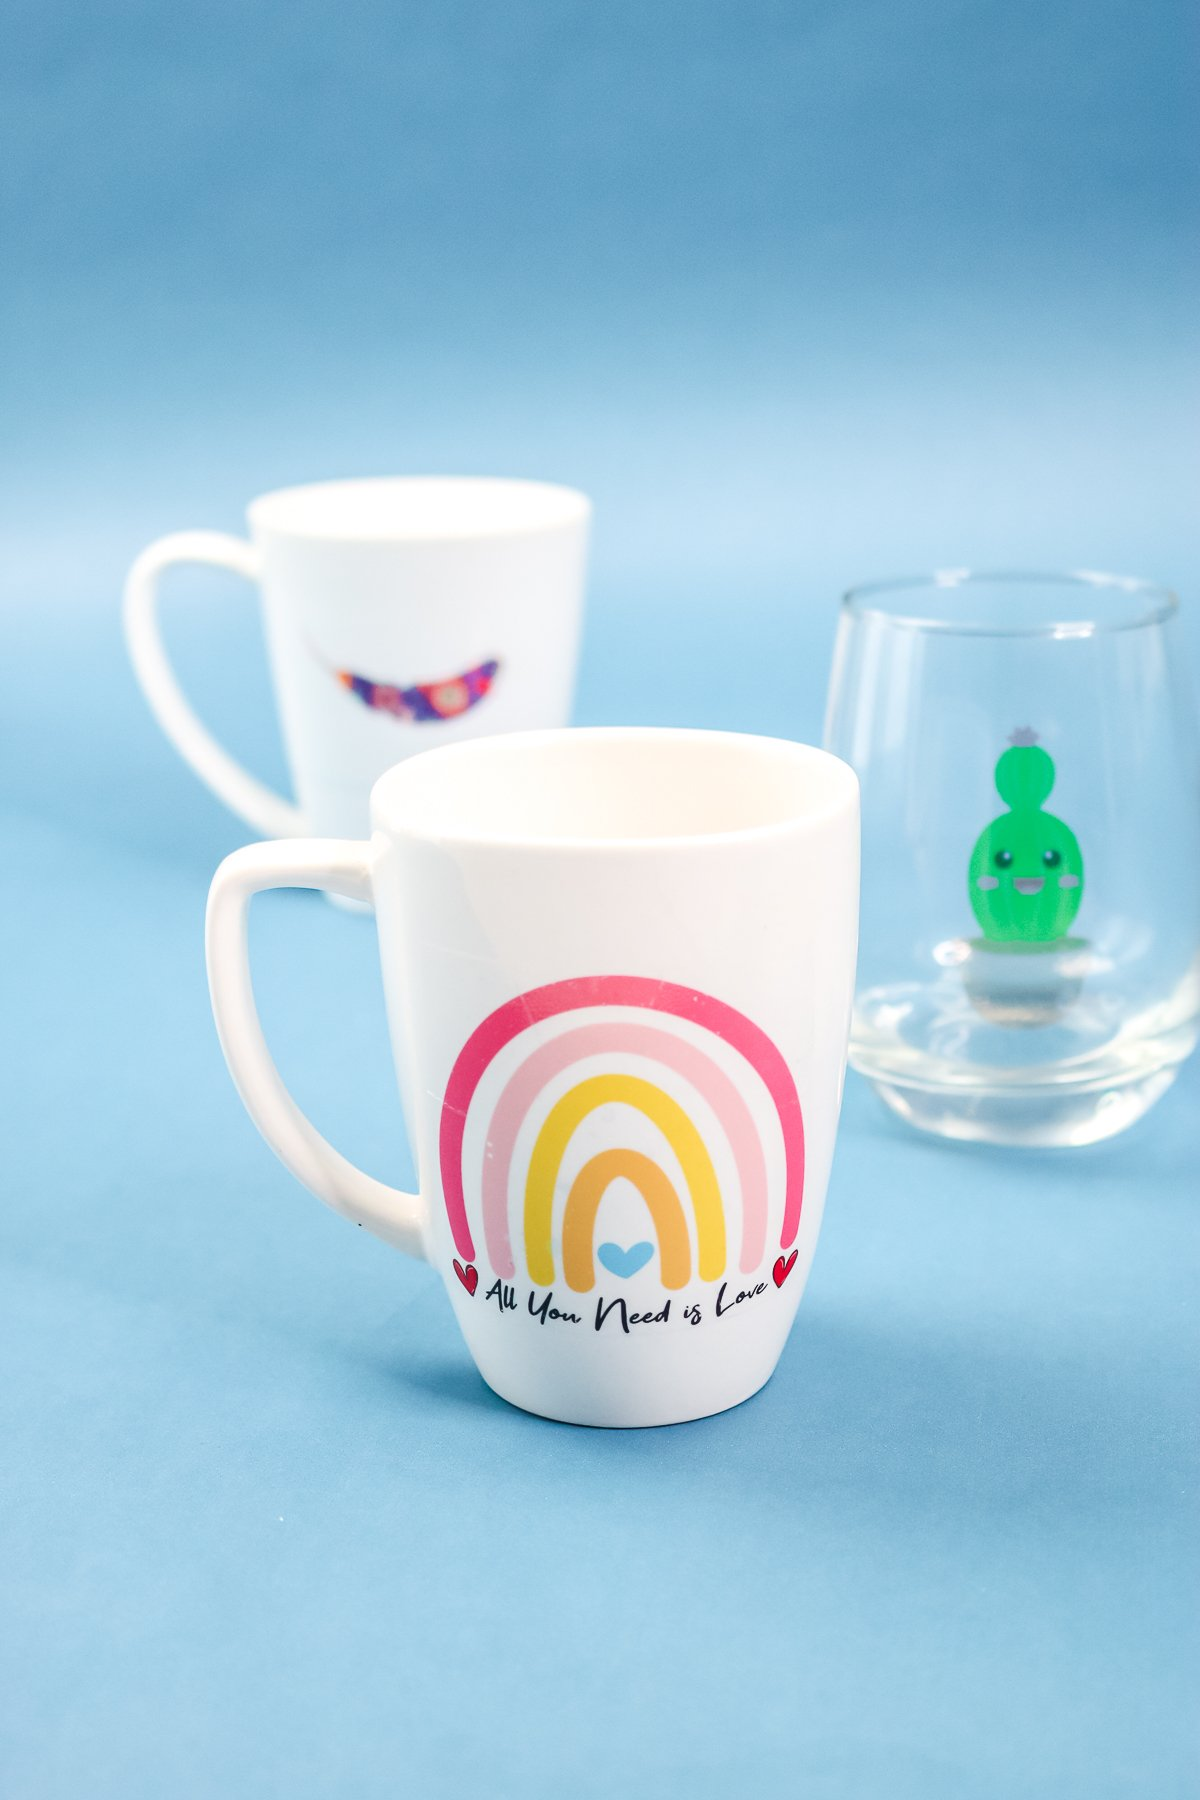 how to put a printed image on a mug